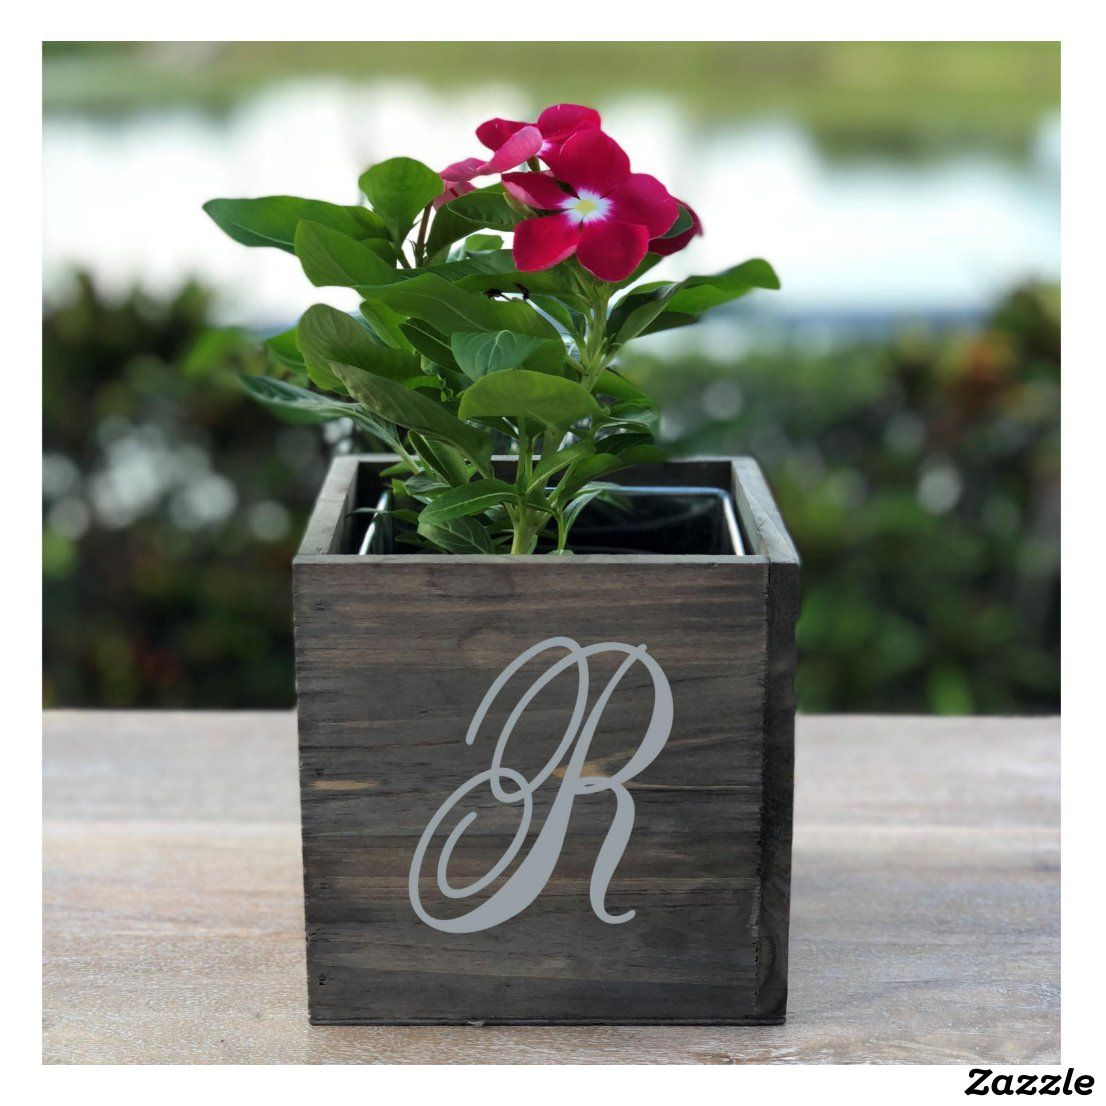 Initial Monogram Wooden Window Planter Box   Zazzle.com